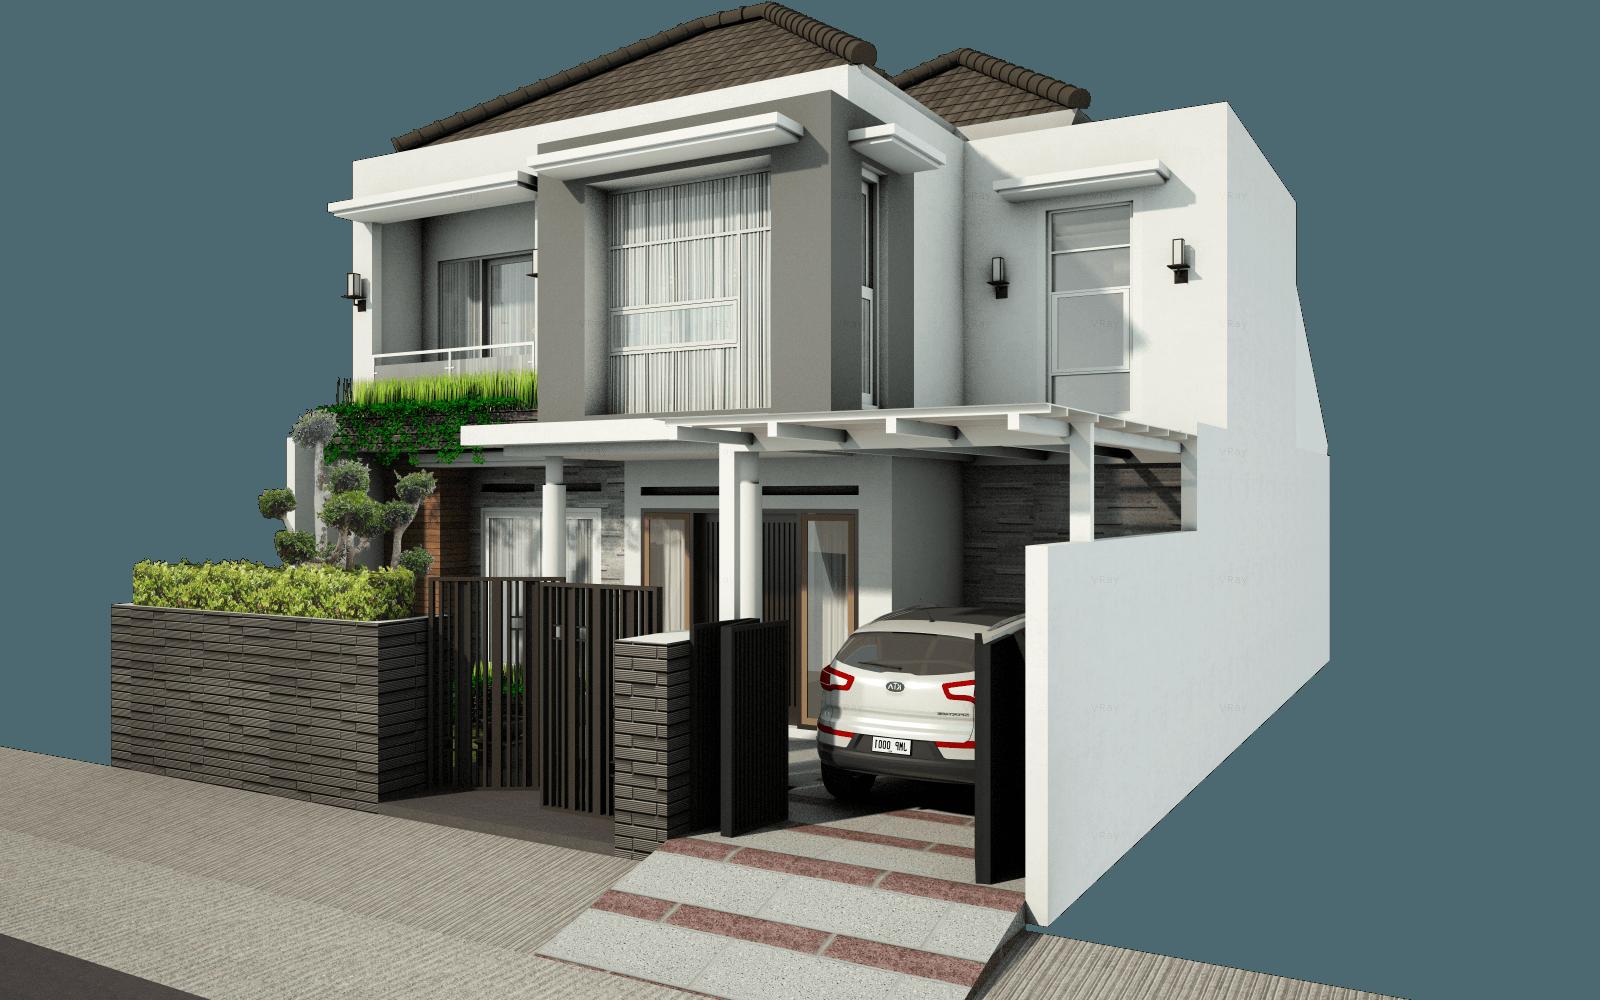 Axis Citra Pama / Axis&m Architects Am-House Solok, Kota Solok, Sumatera Barat, Indonesia Solok, Kota Solok, Sumatera Barat, Indonesia Axis-Citra-Pama-Axism-Architects-Am-House  60521